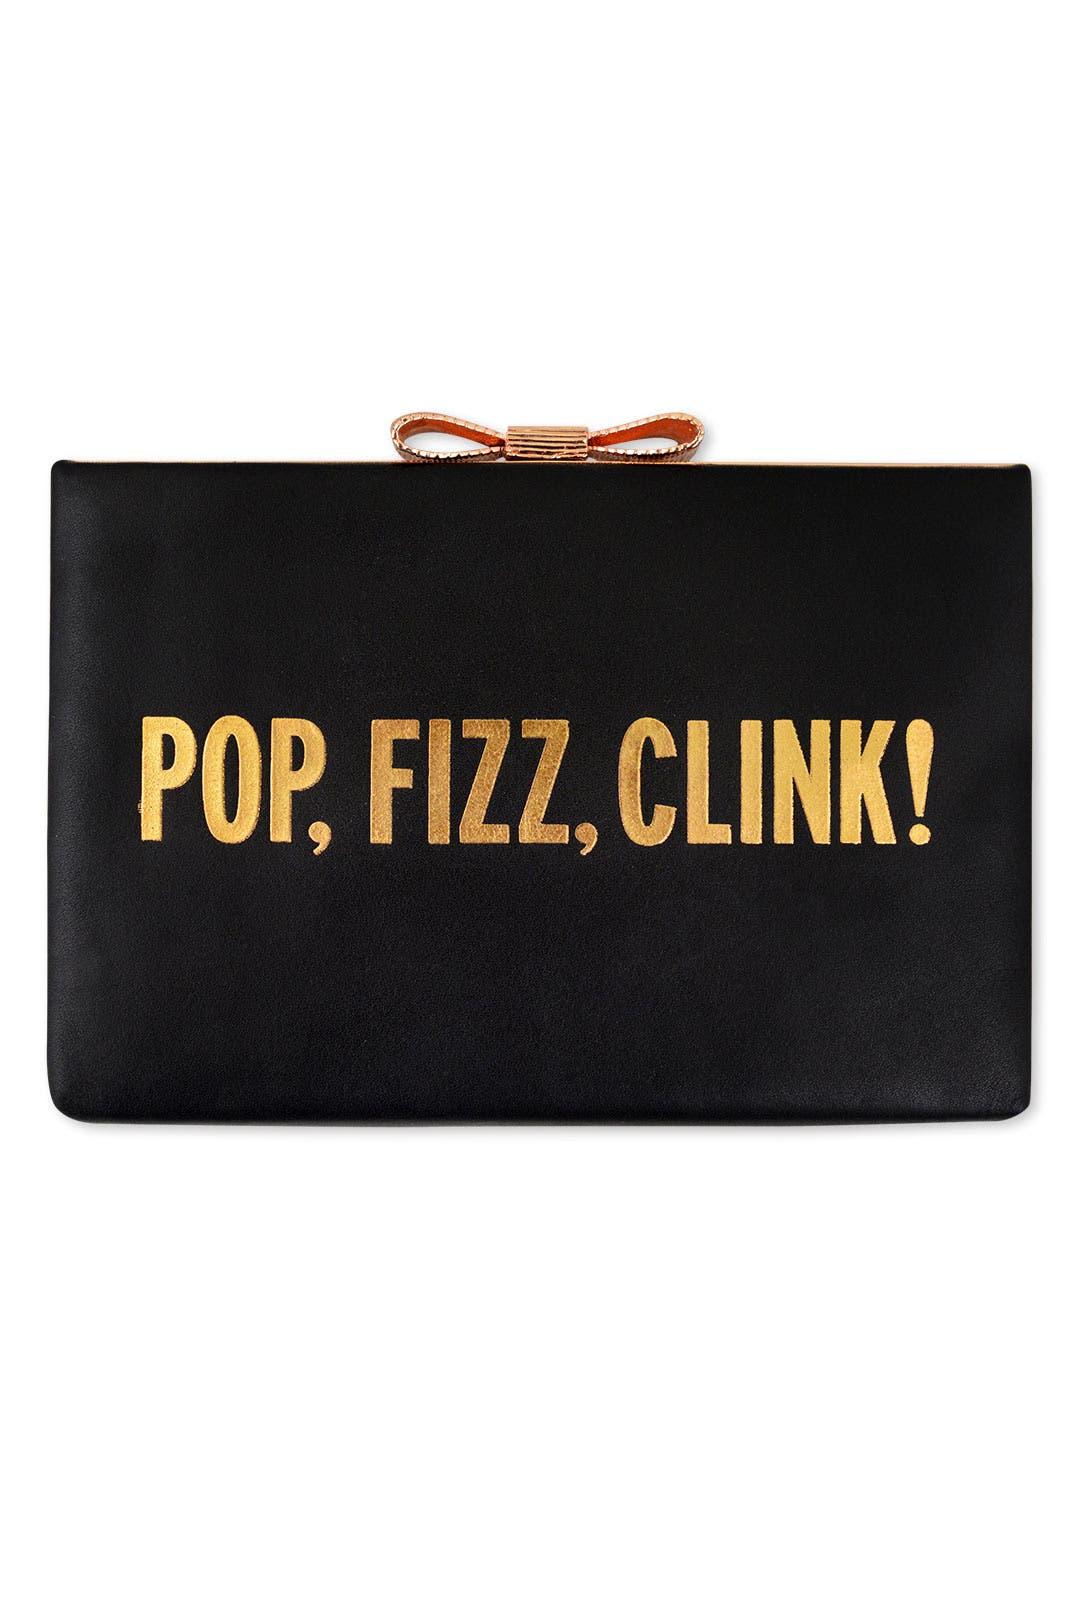 Pop Fizz Clink Clutch by kate spade new york accessories